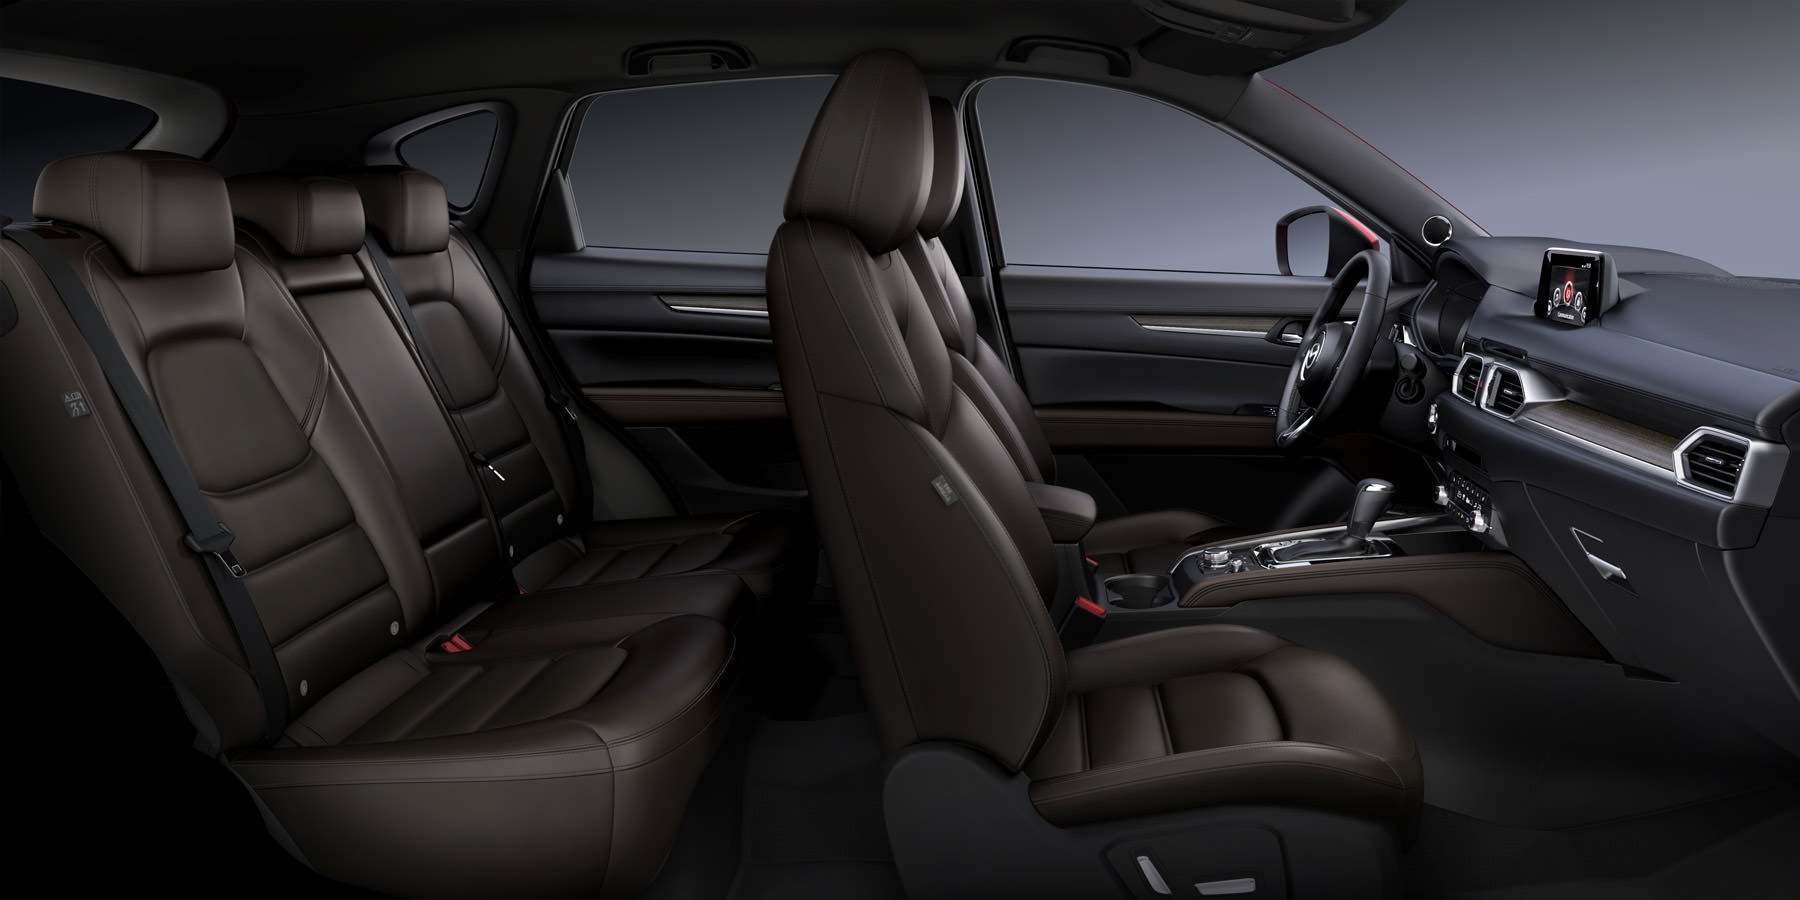 Mazda MX-5 Modellabbildung, Blick in den Innenraum